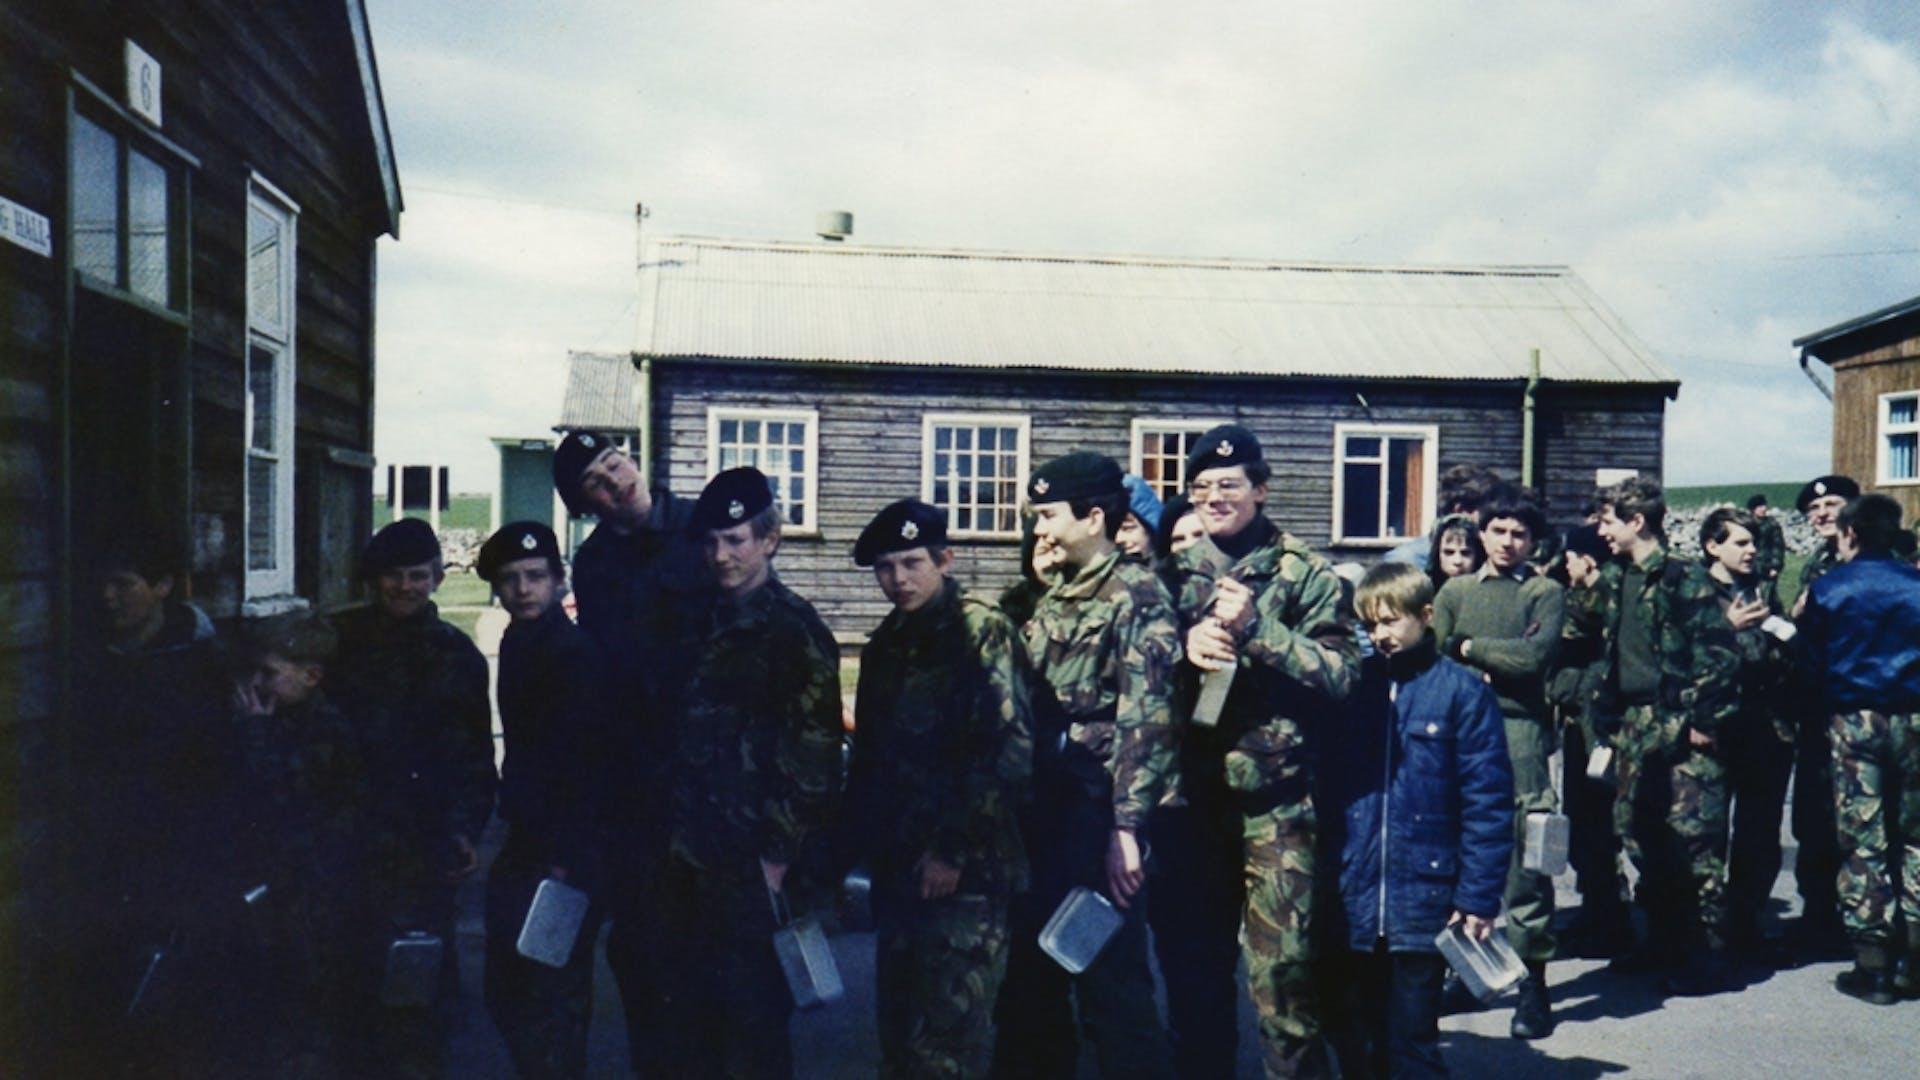 13 19860606 Midsomer Norton Platoon Yoxter